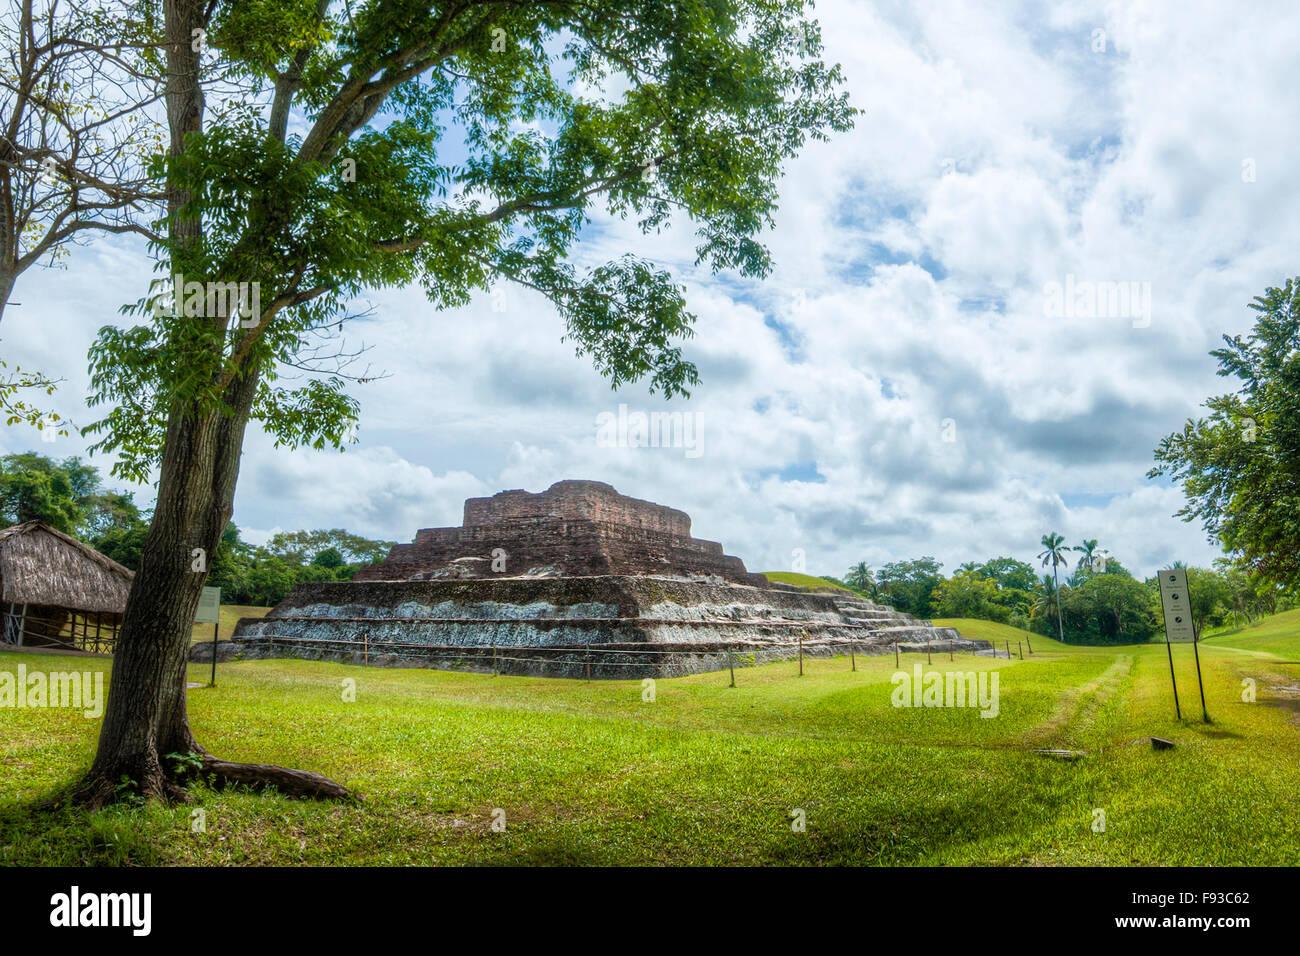 Trees and pyramid at the Mayan ruins of Comalcalco, Tabasco, Mexico. - Stock Image